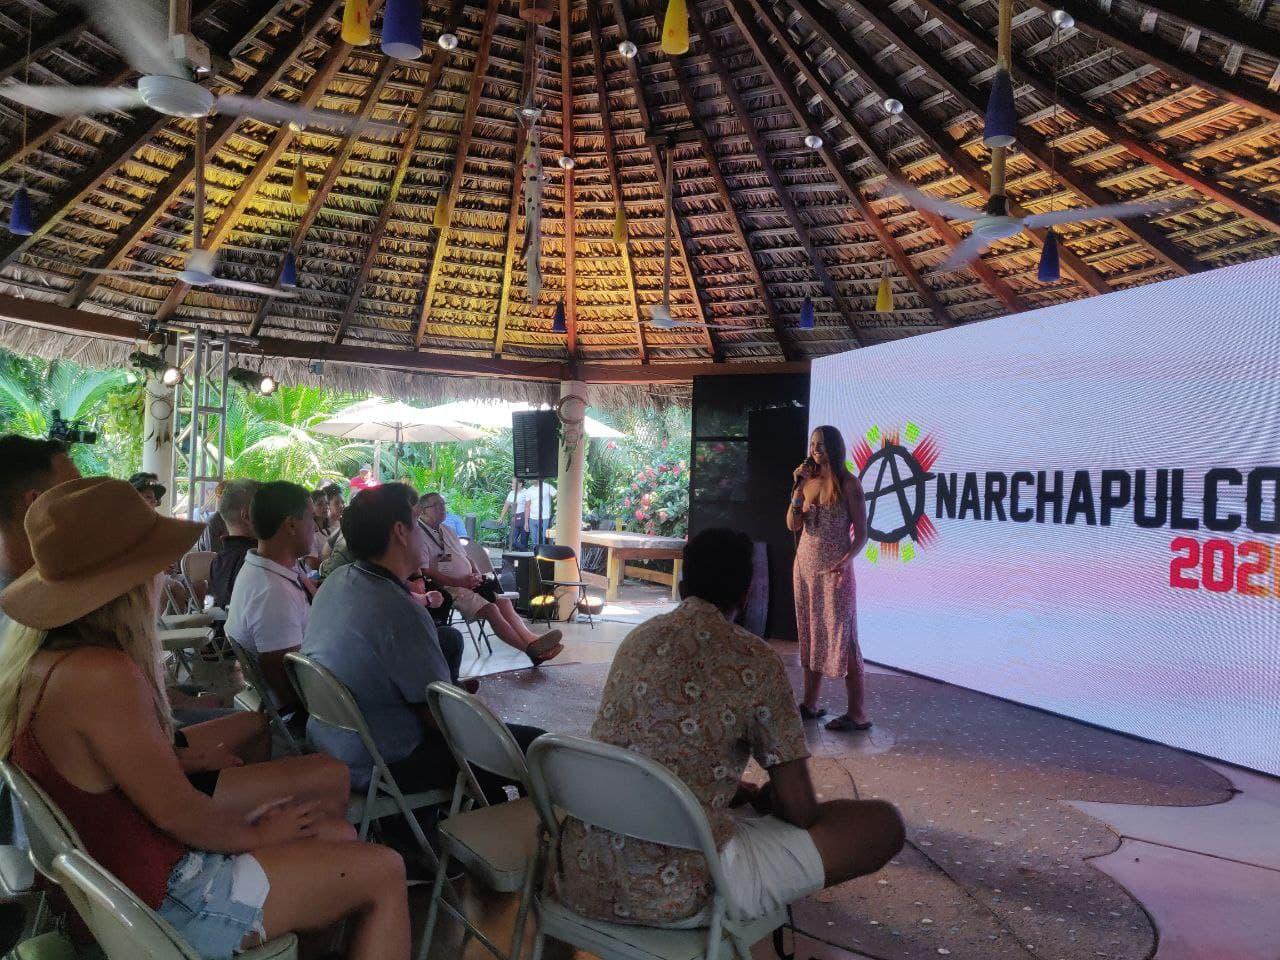 macey anarchapulco 2021